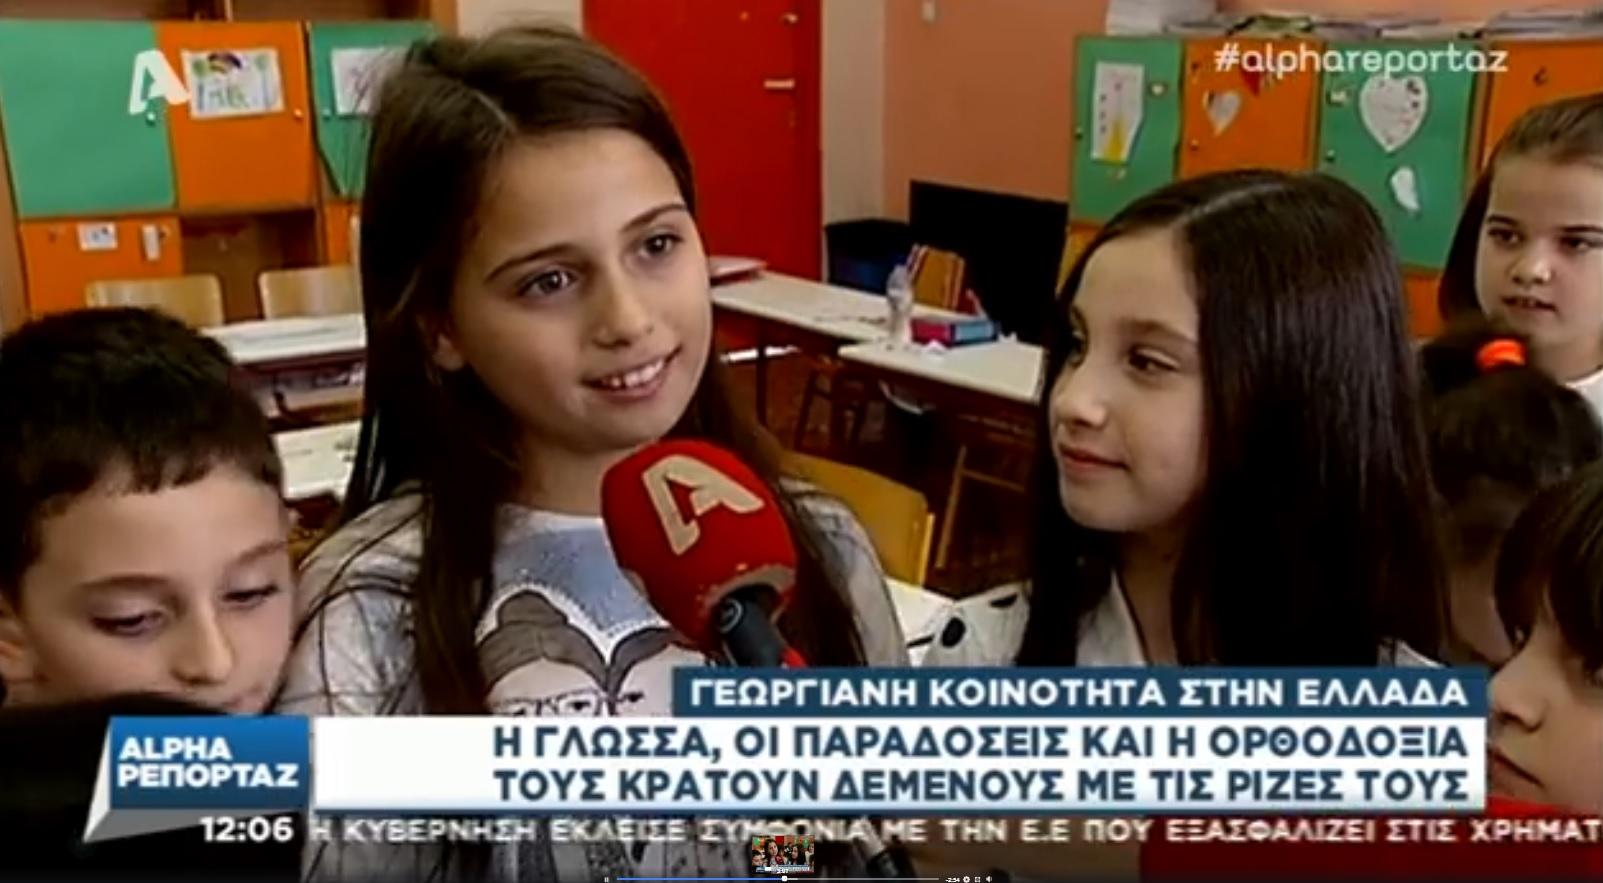 Photo of ALFA TV-ს მორიგი სიუჟეტი საბერძნეთში მცხოვრები ქართველი ემიგრანტების შესახებ